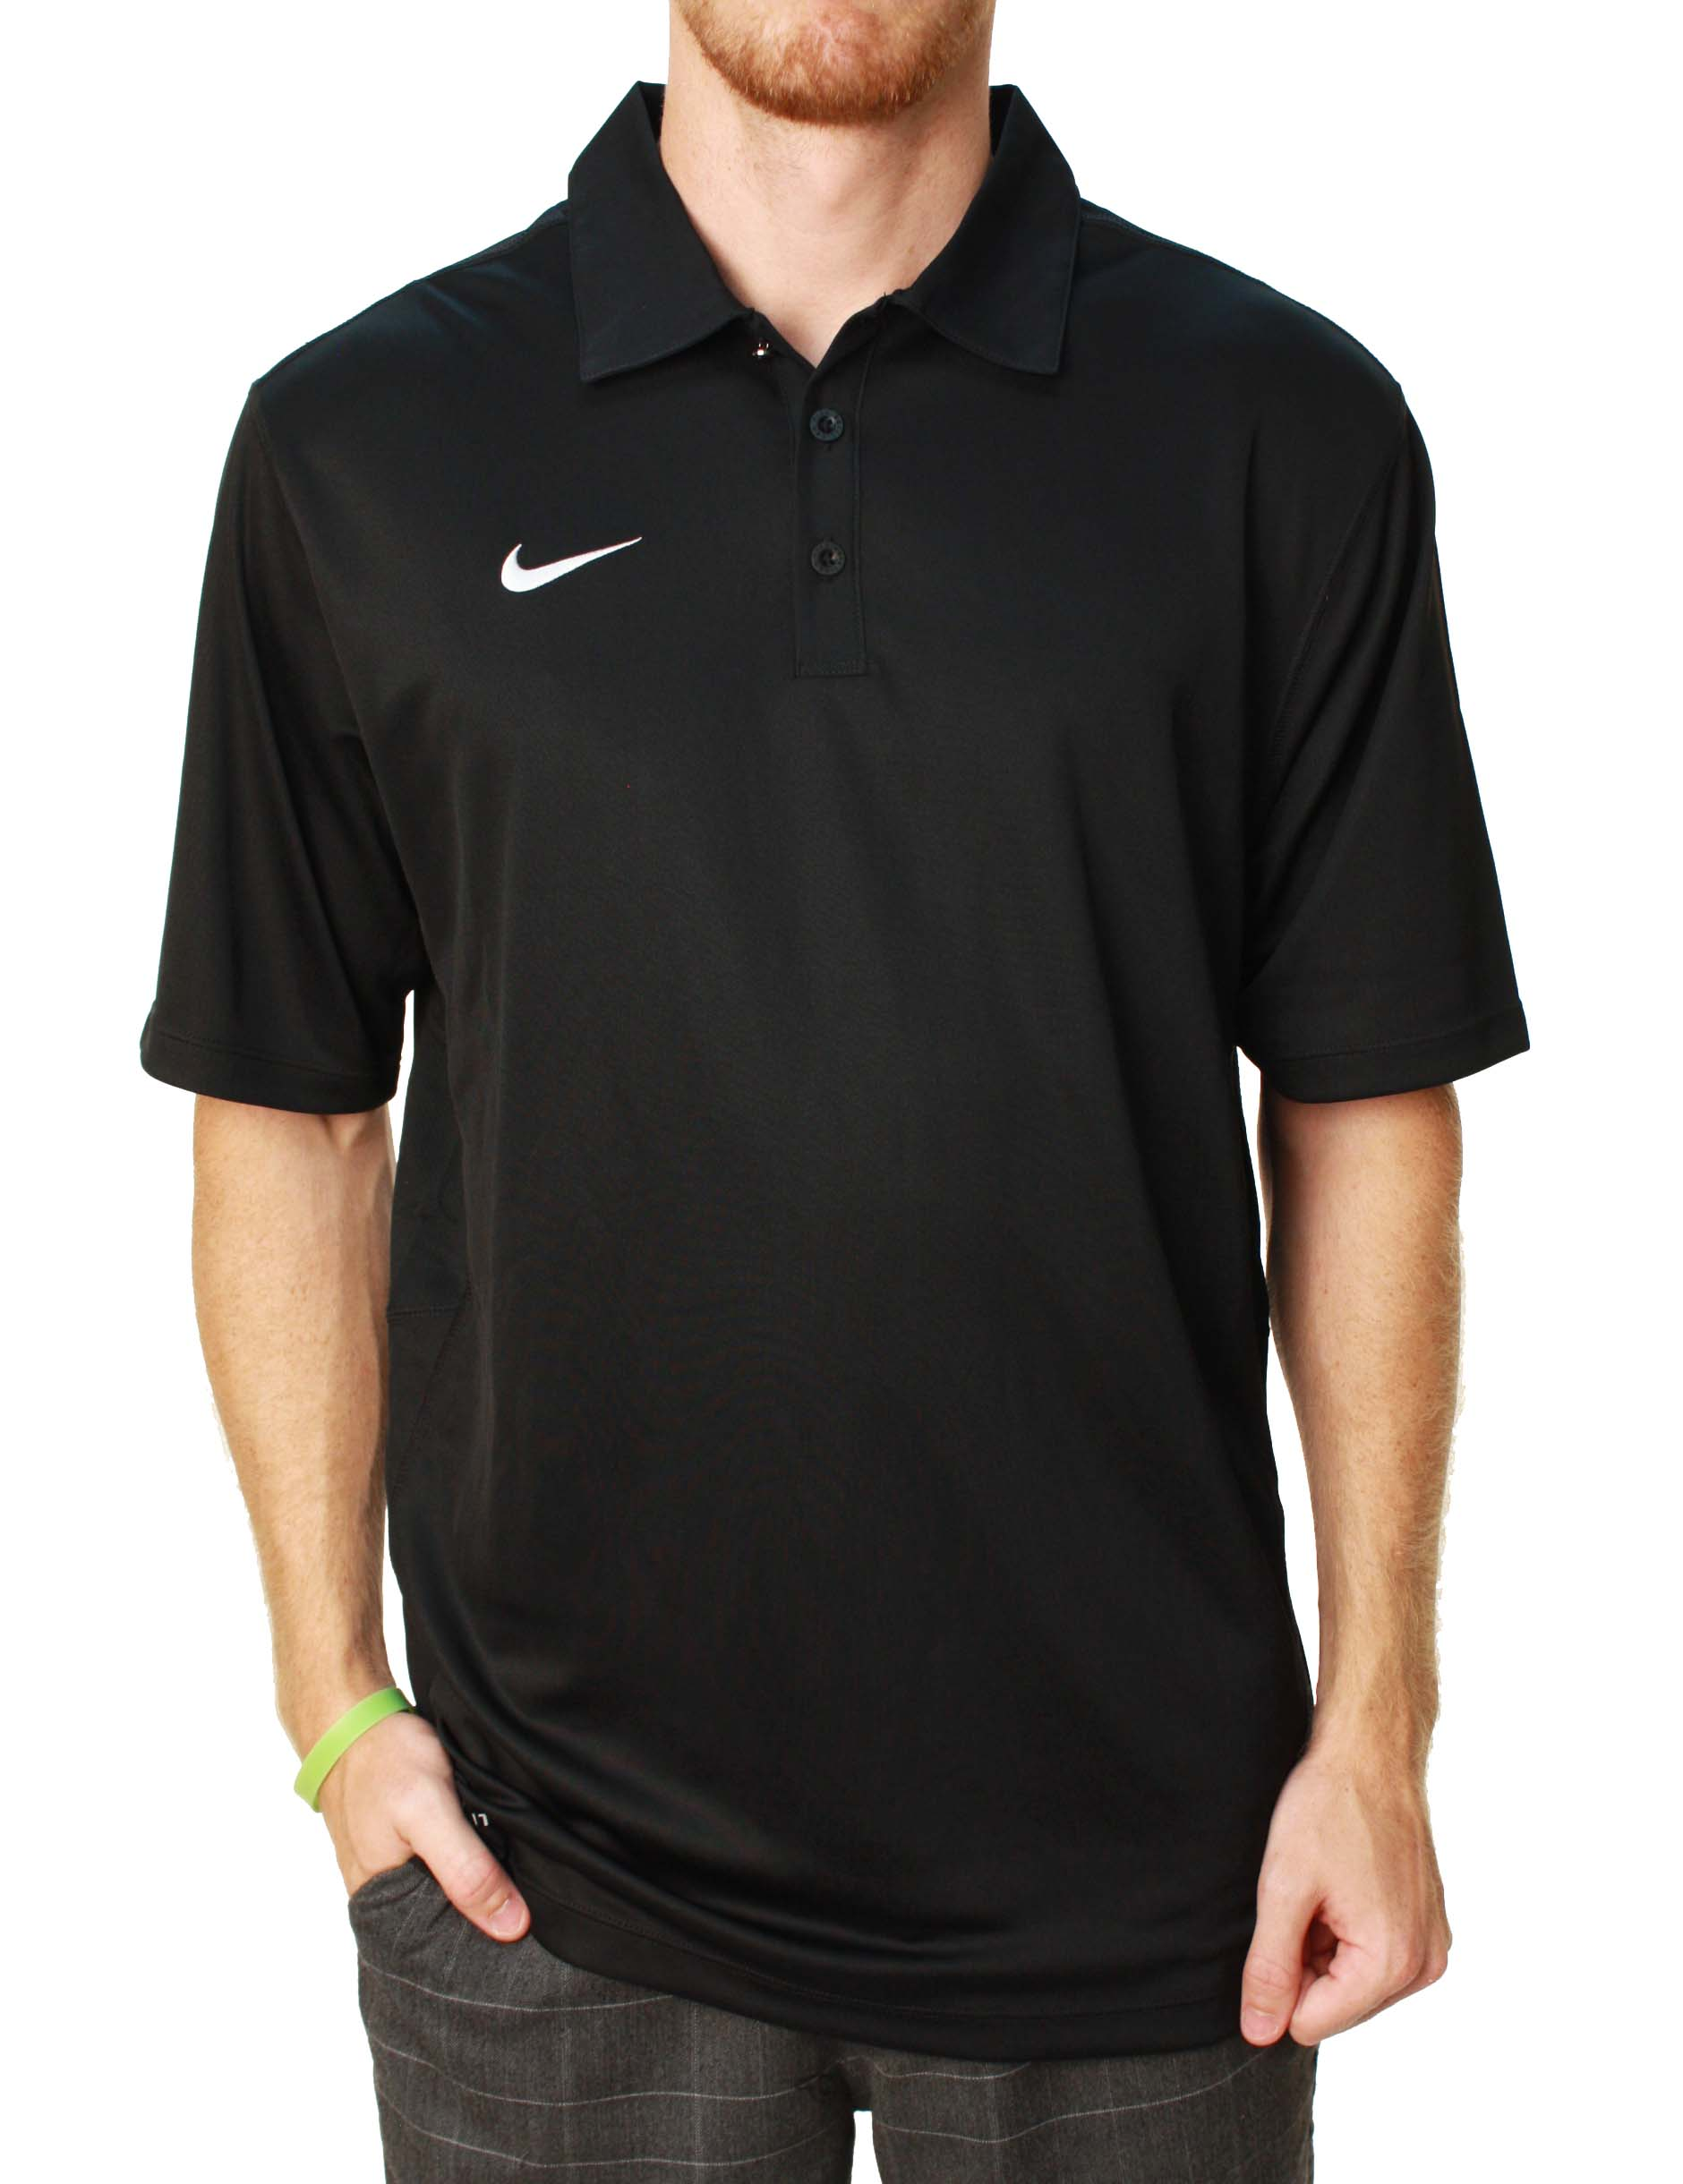 Nike Men's Dri-Fit Short Sleeve Training Polo Shirt at Sears.com